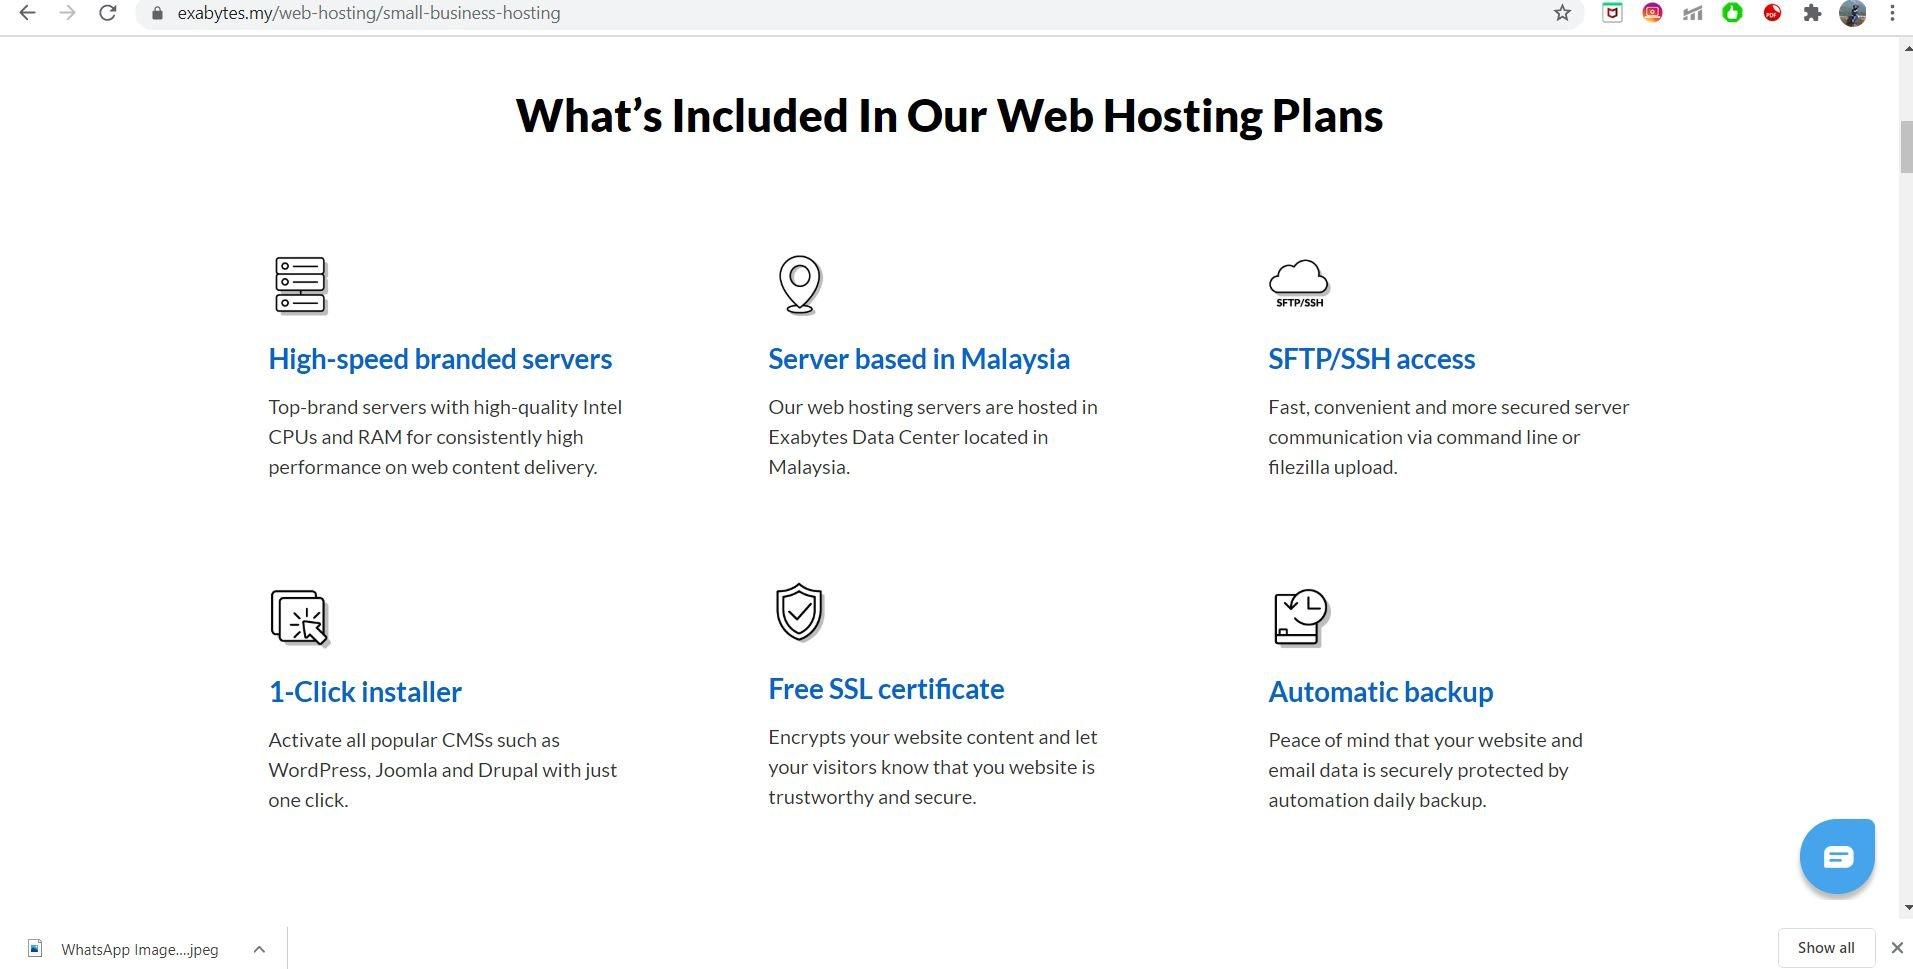 Exabytes Web Hosting features